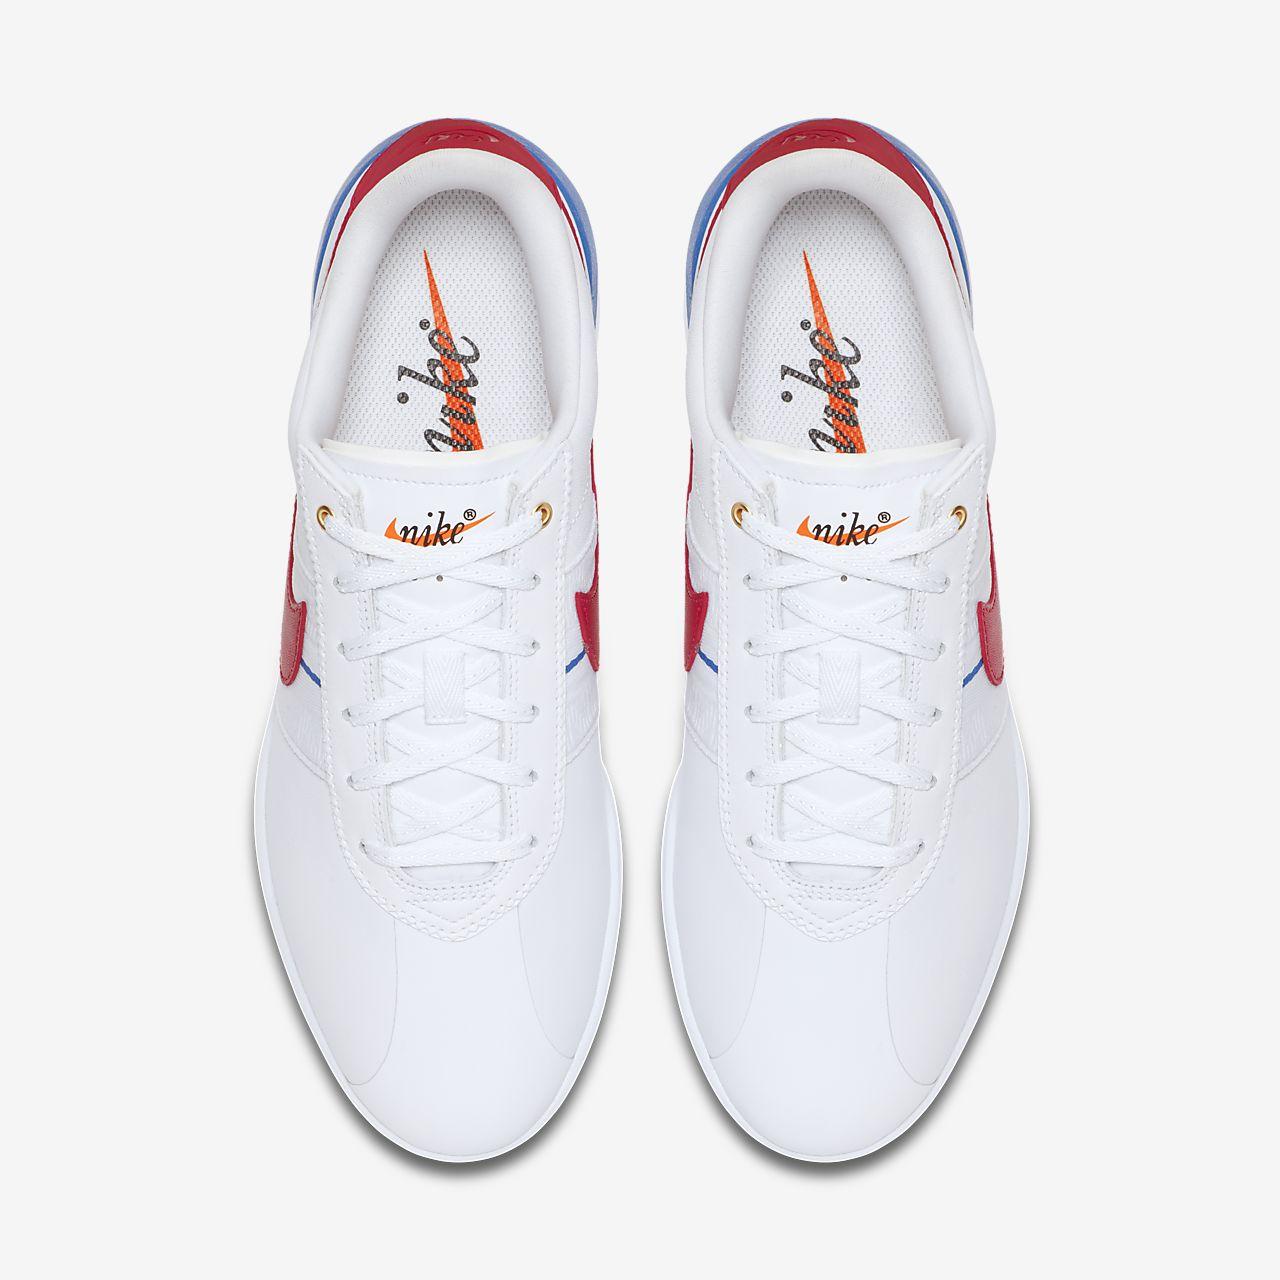 intervalo espejo masilla  Nike Cortez G Women's Golf Shoe. Nike AE